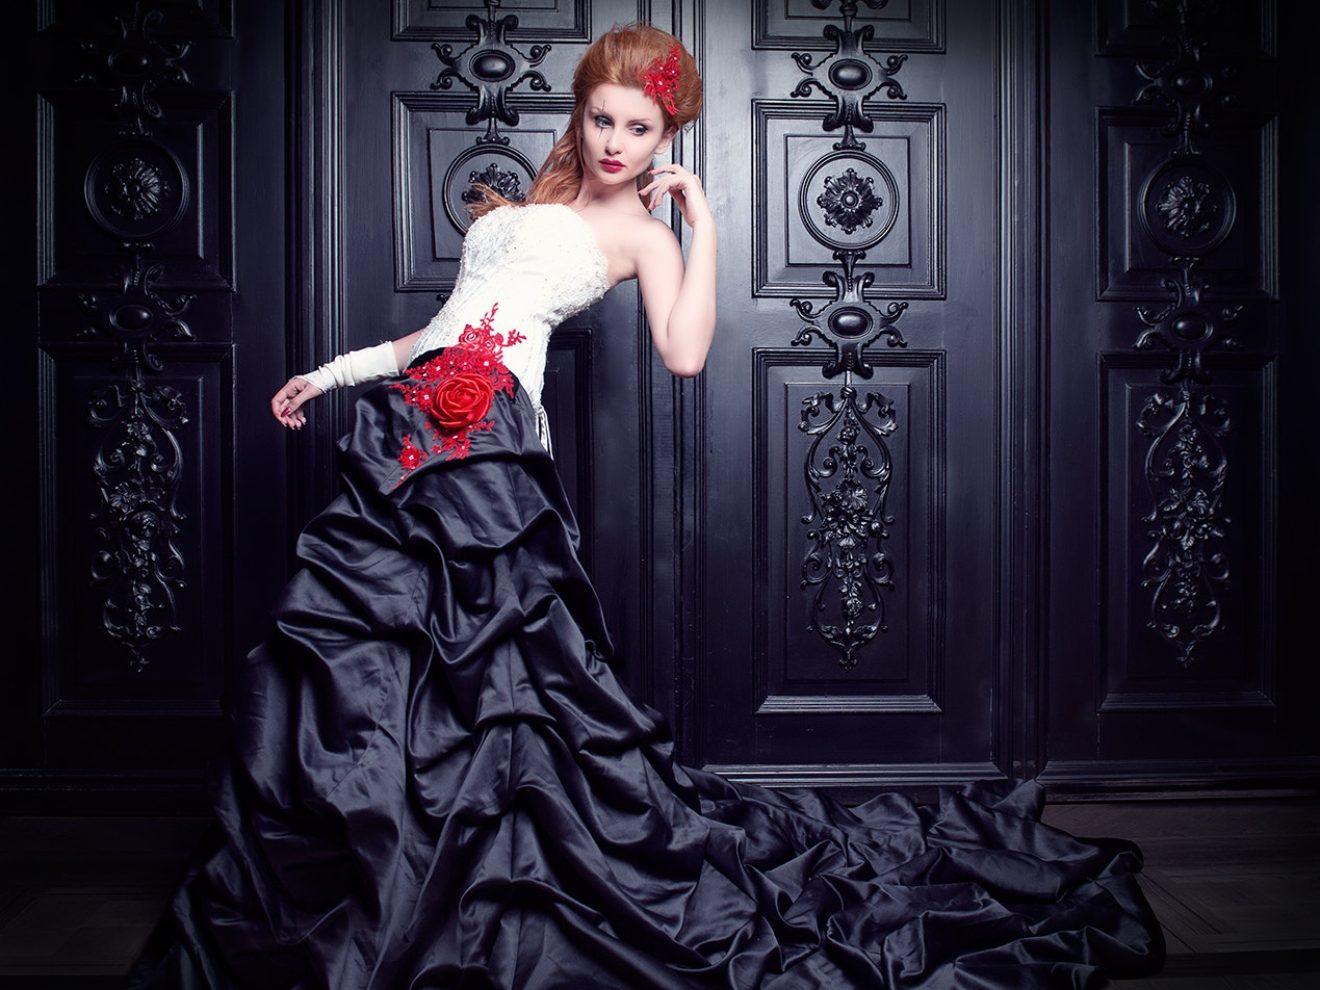 Blood Desires, Vampiric Sexuality, and Heteronormativity